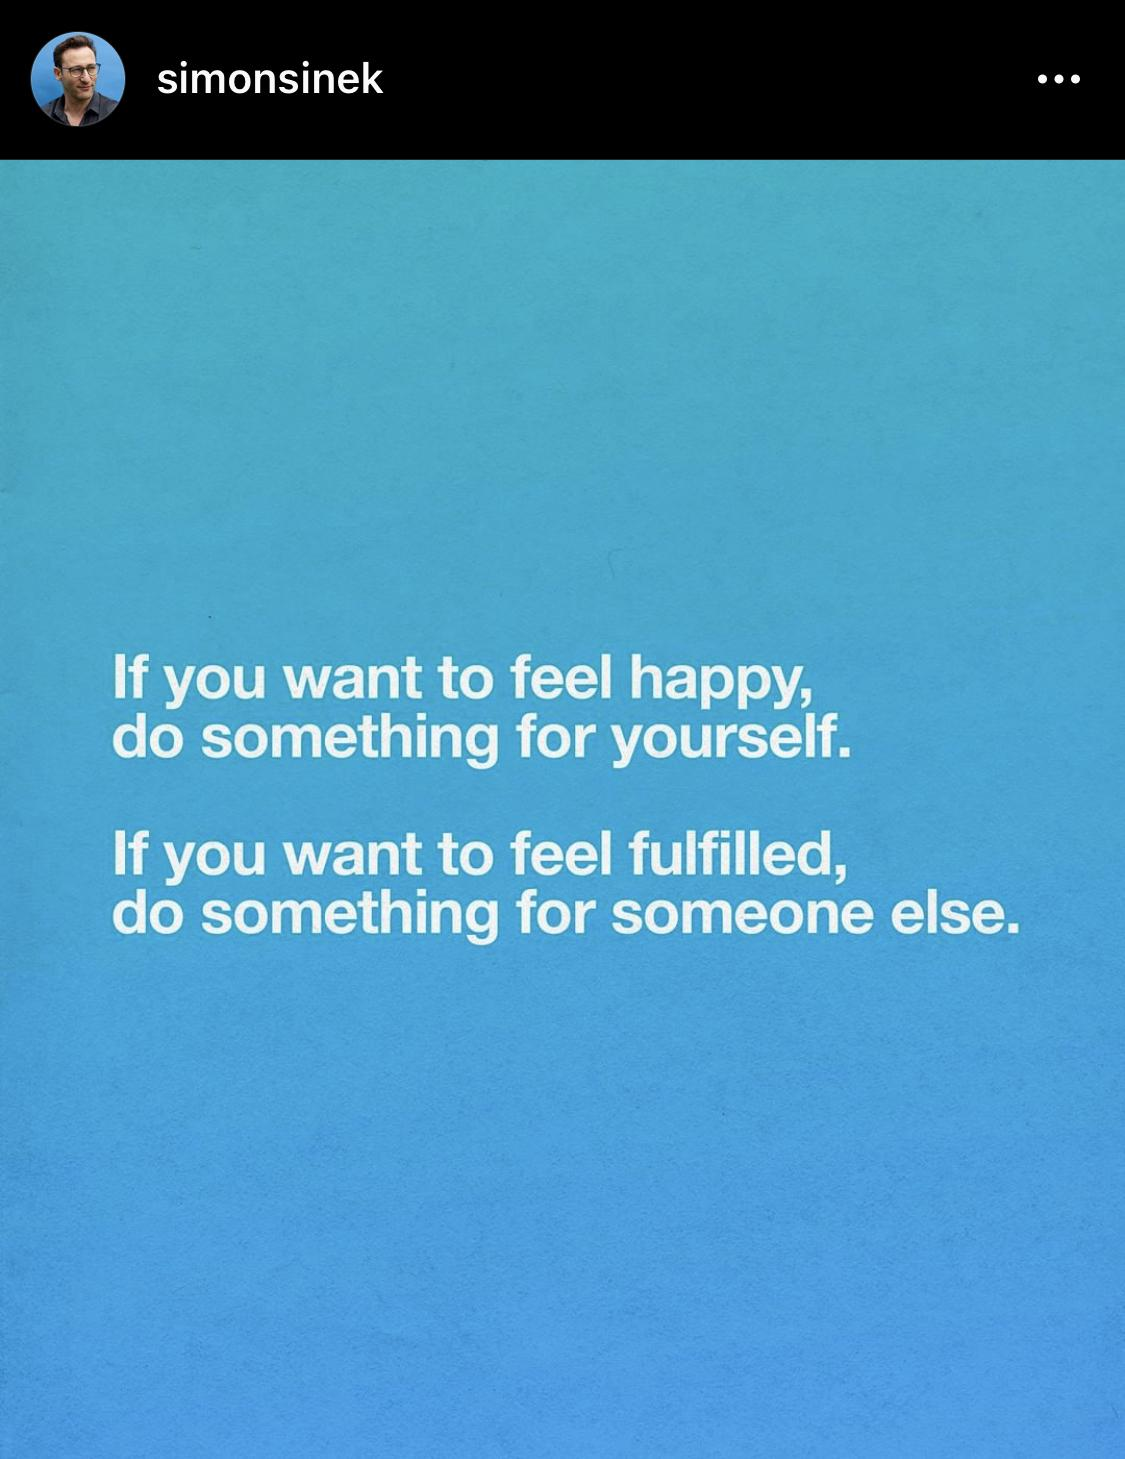 [Image] Happy vs Fulfilled